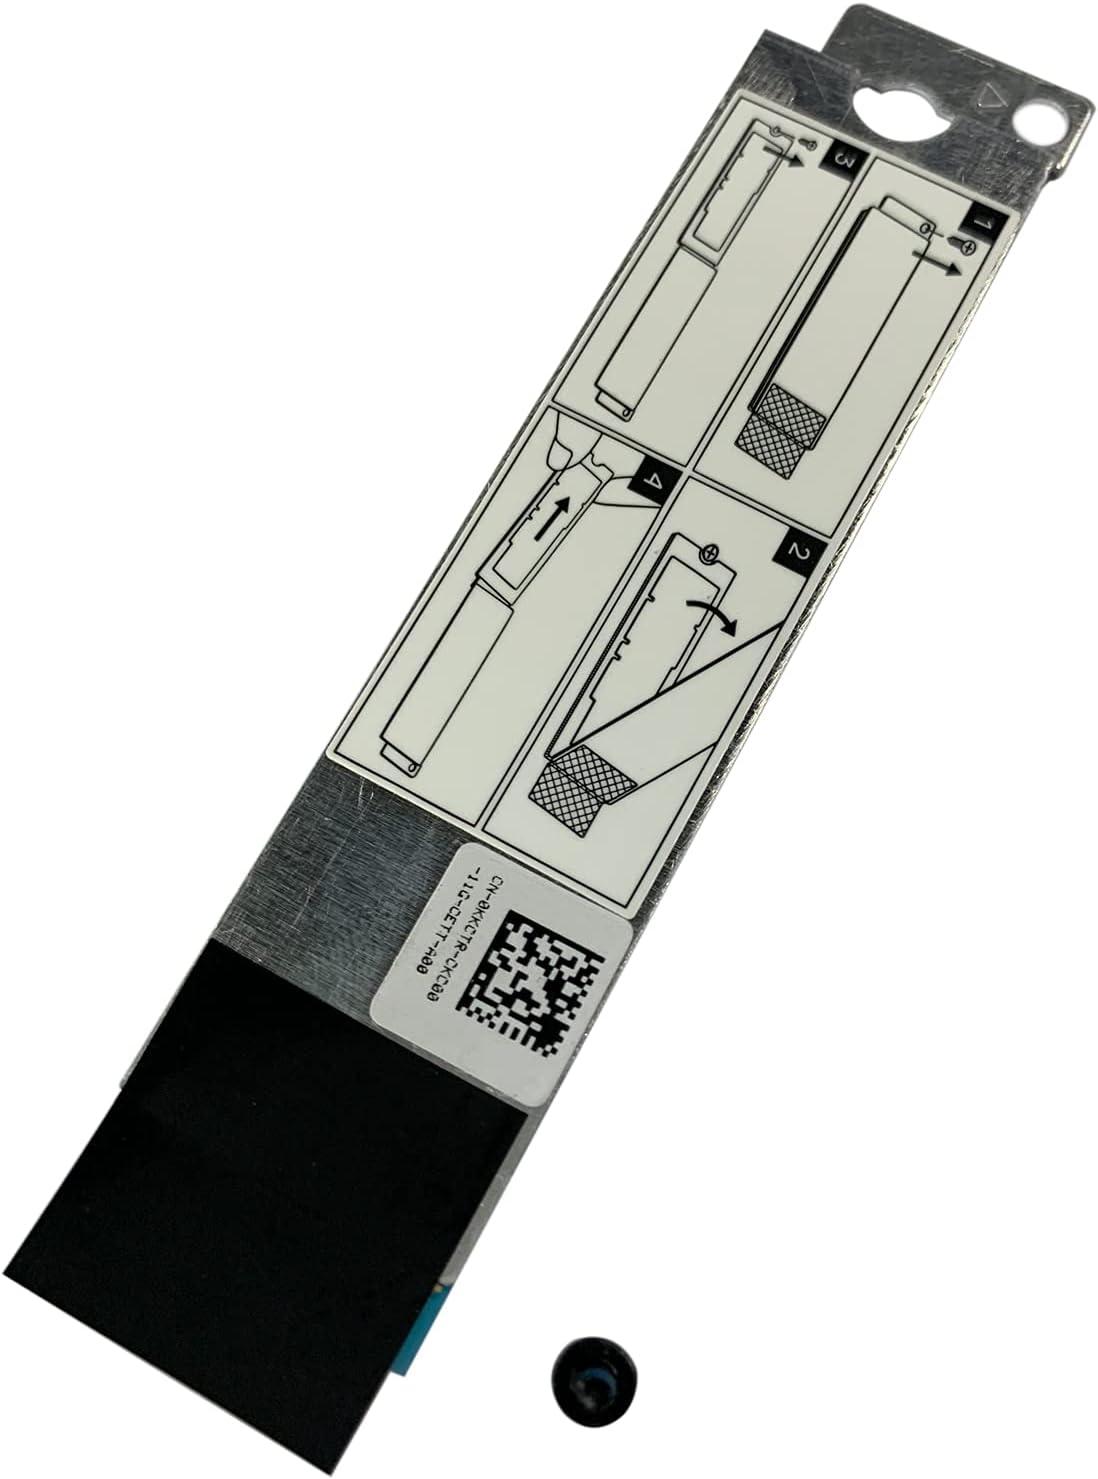 BestParts M.2 Shield Caddy for DELL G7 15 7500 17 7700 M.2 2280 NVME SSD Bracket KKCTR 0KKCTR US